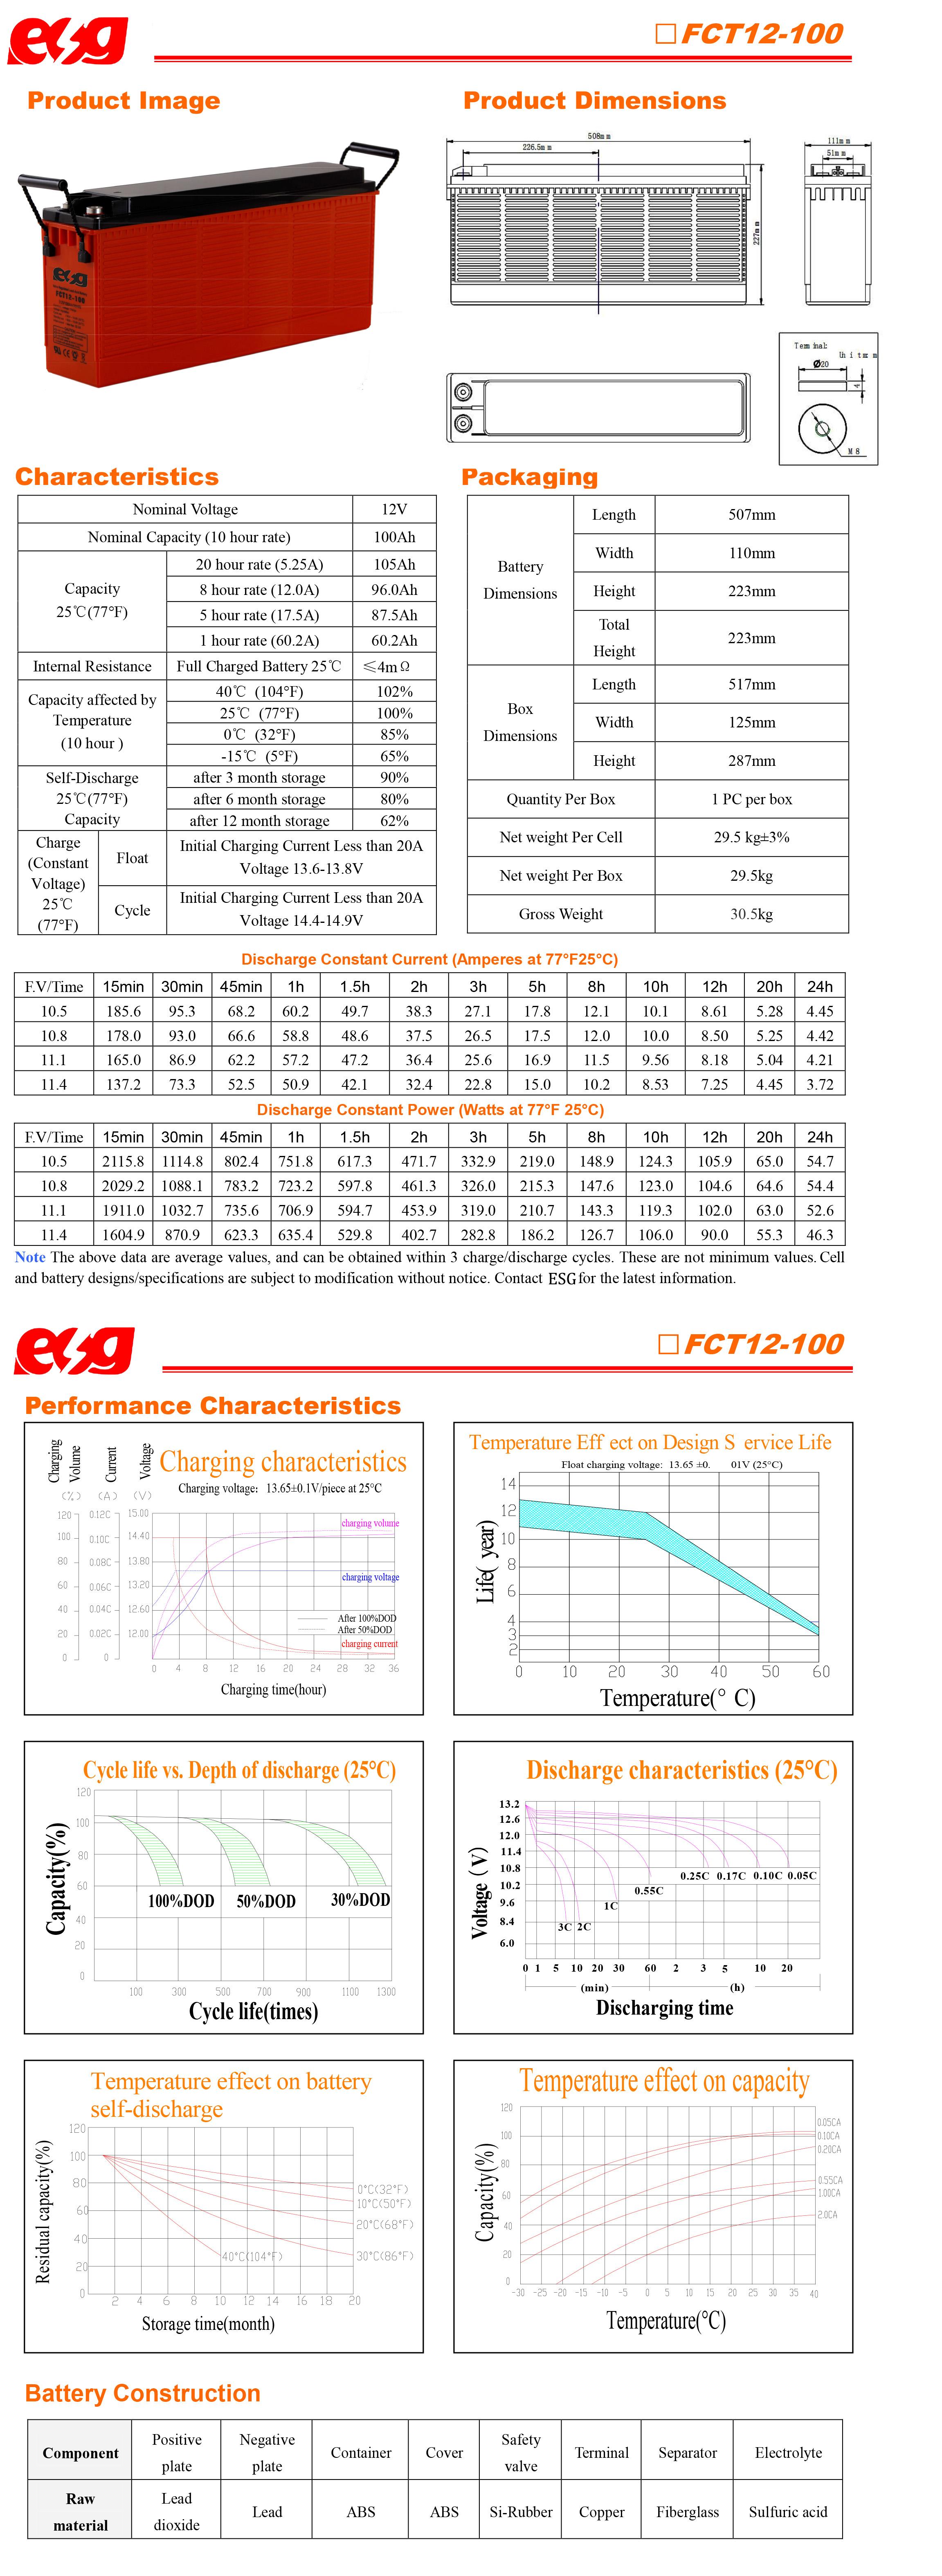 ESG 12-100.jpg